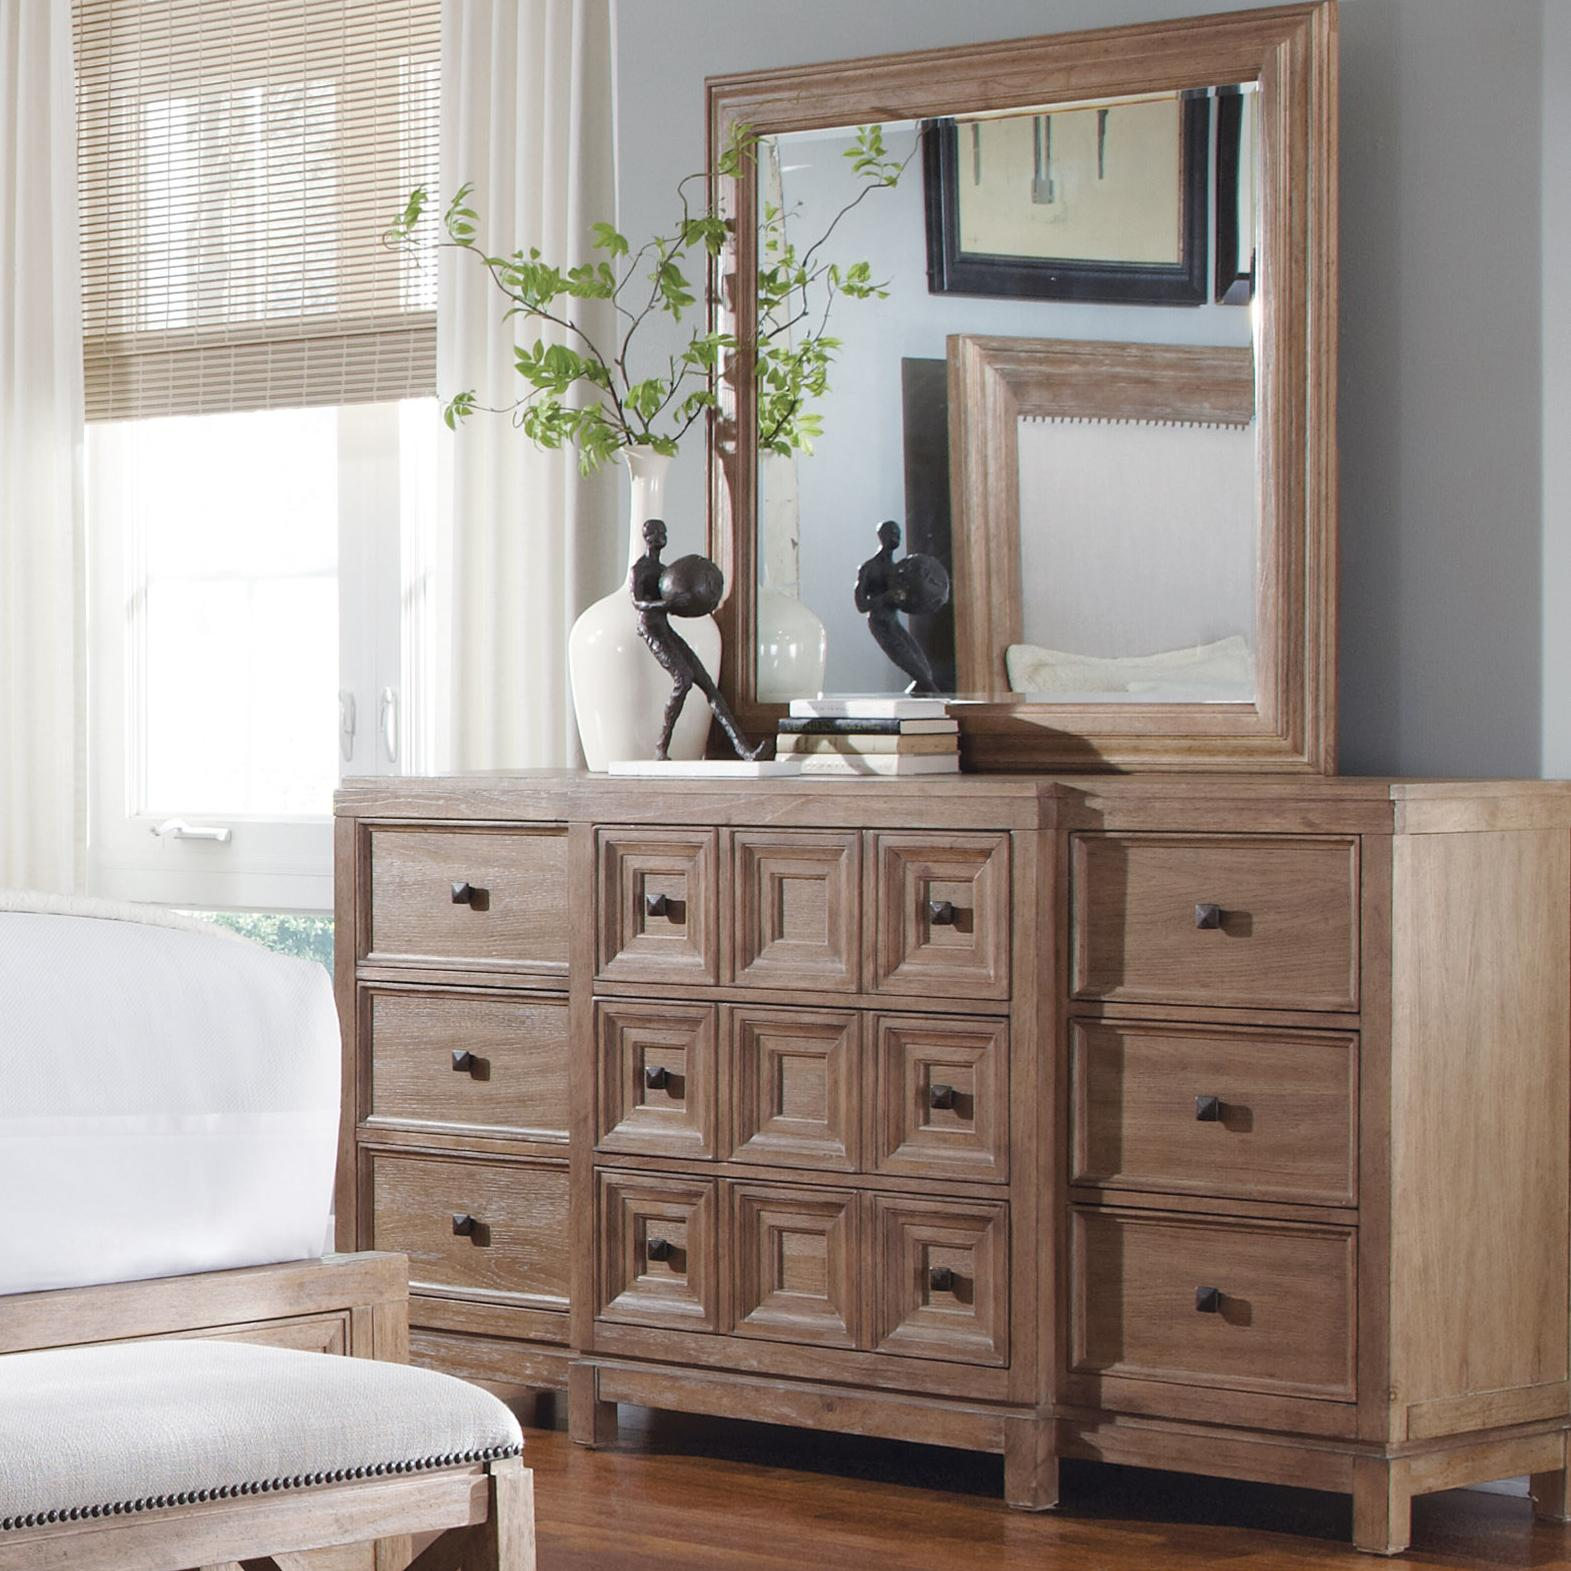 Belfort Signature Madera Dresser & Mirror Set - Item Number: 192130-2303+192120